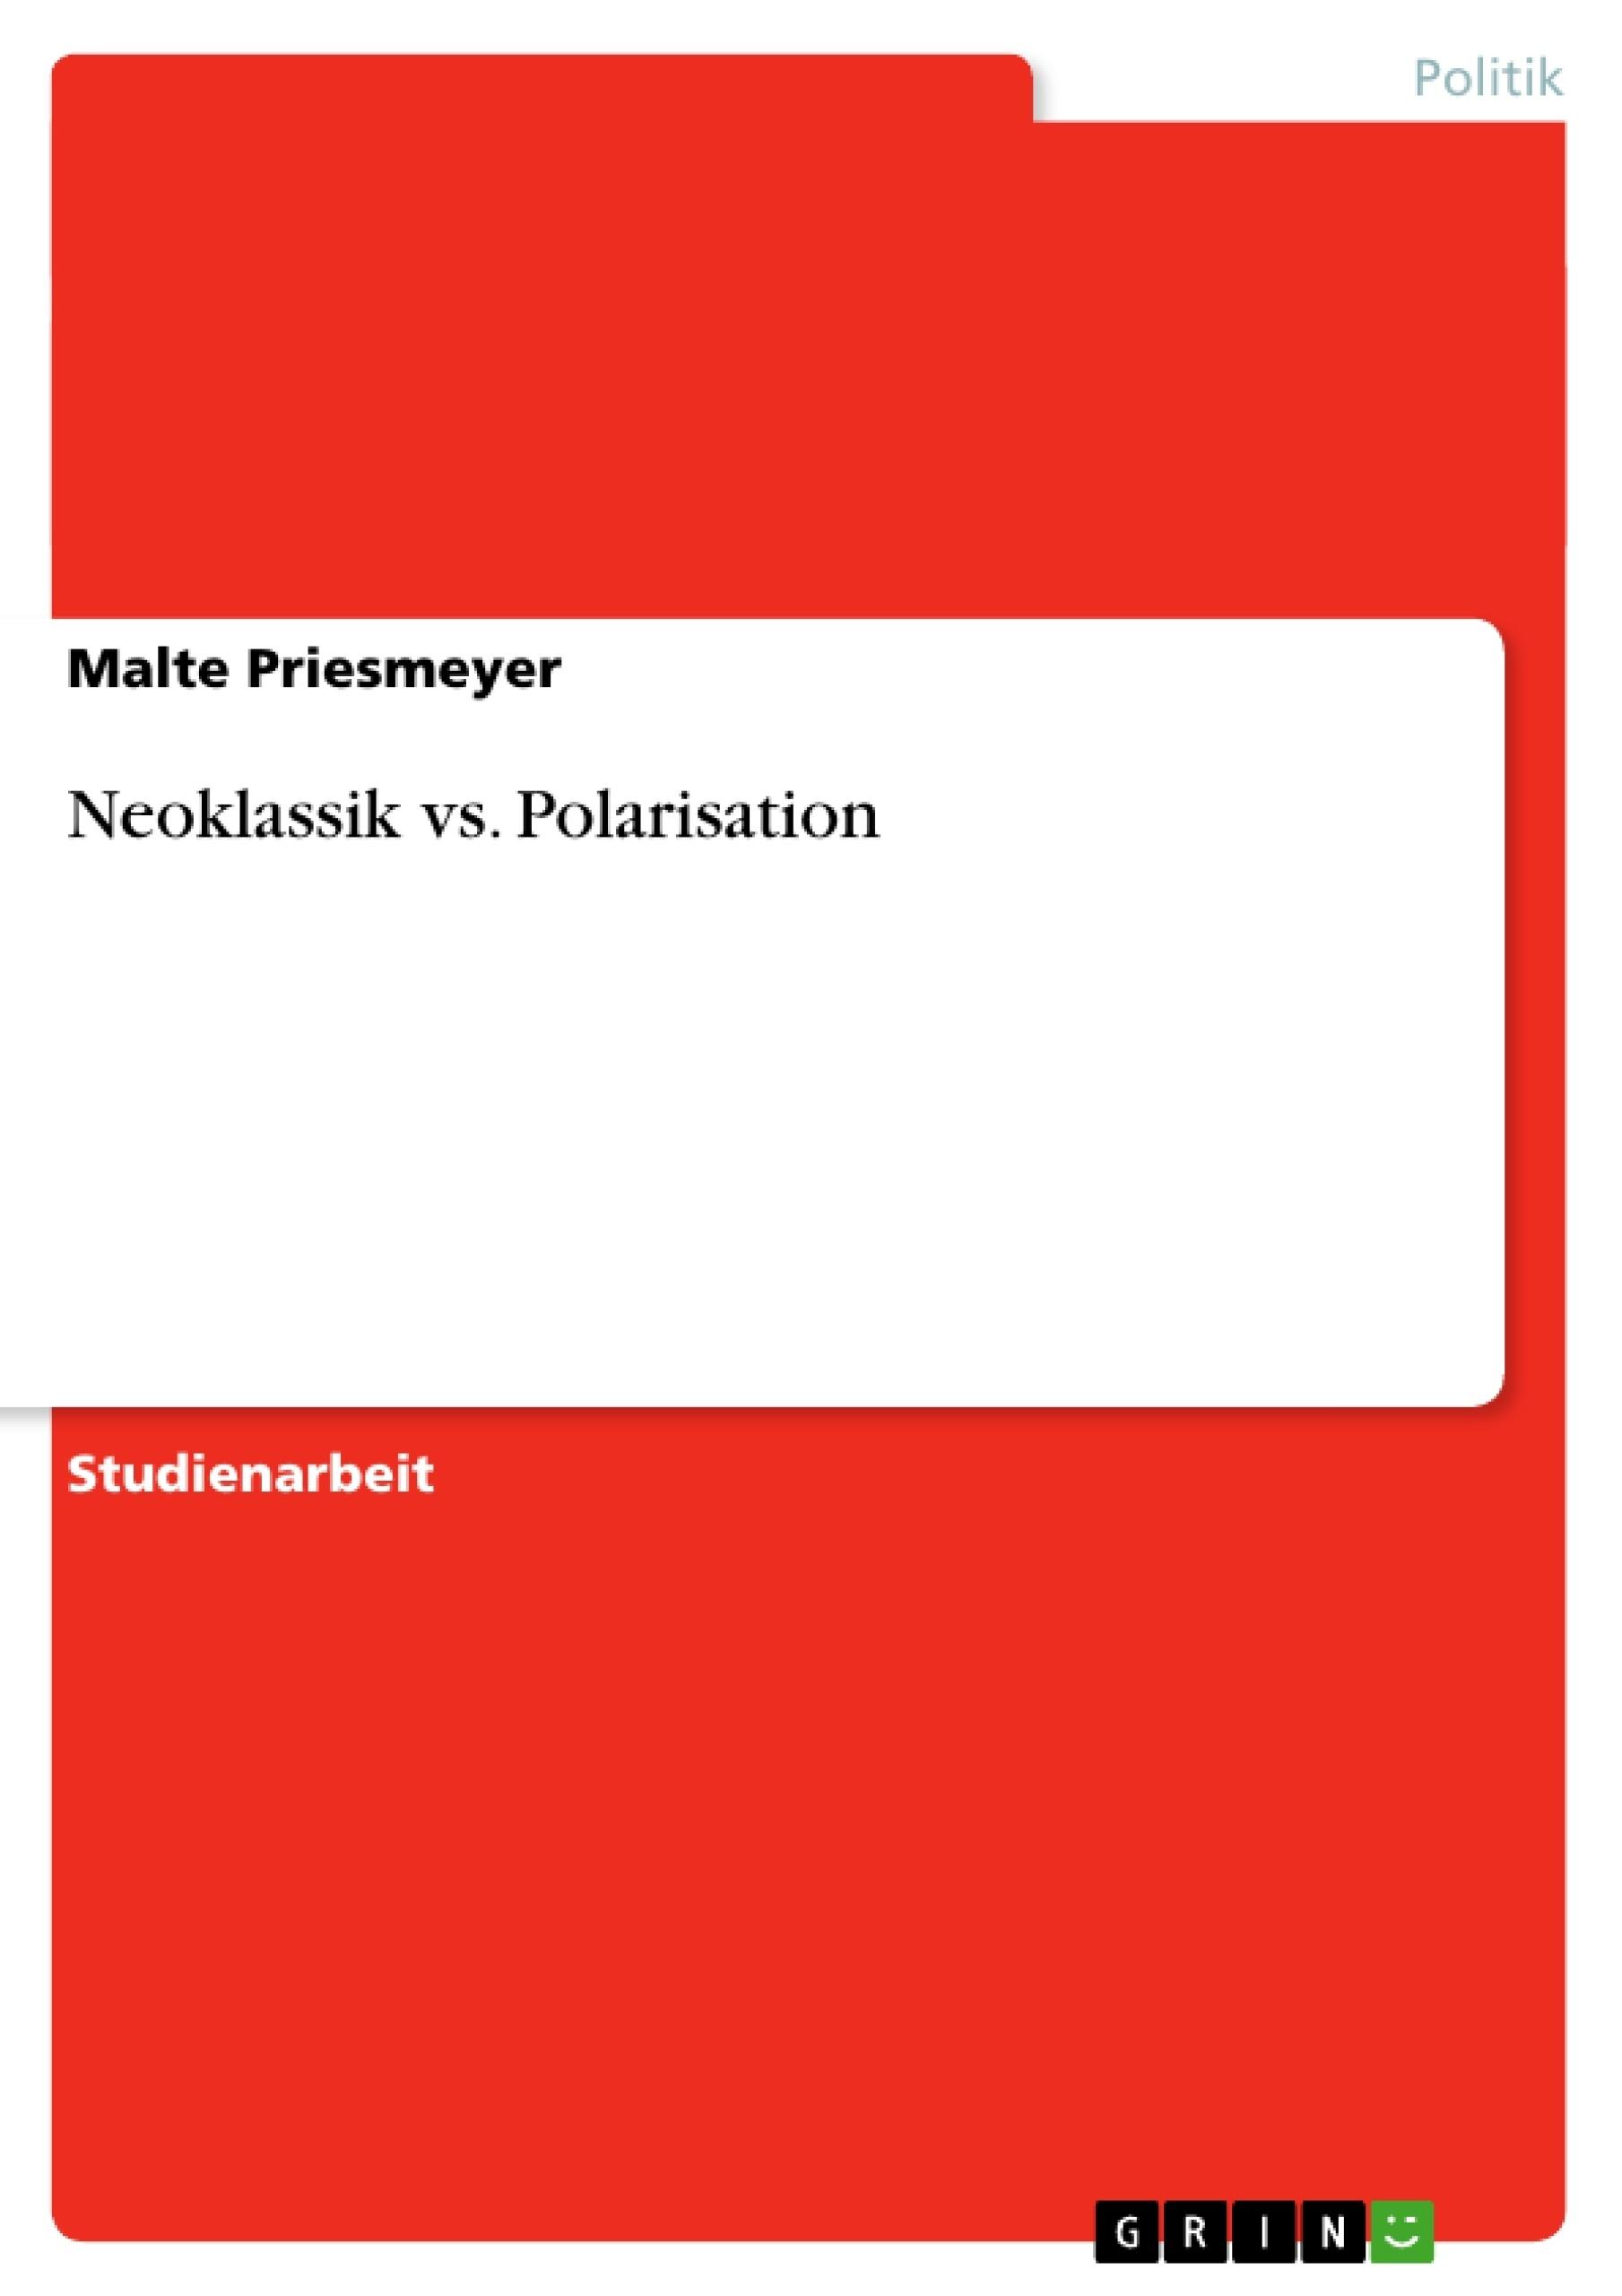 Titel: Neoklassik vs. Polarisation